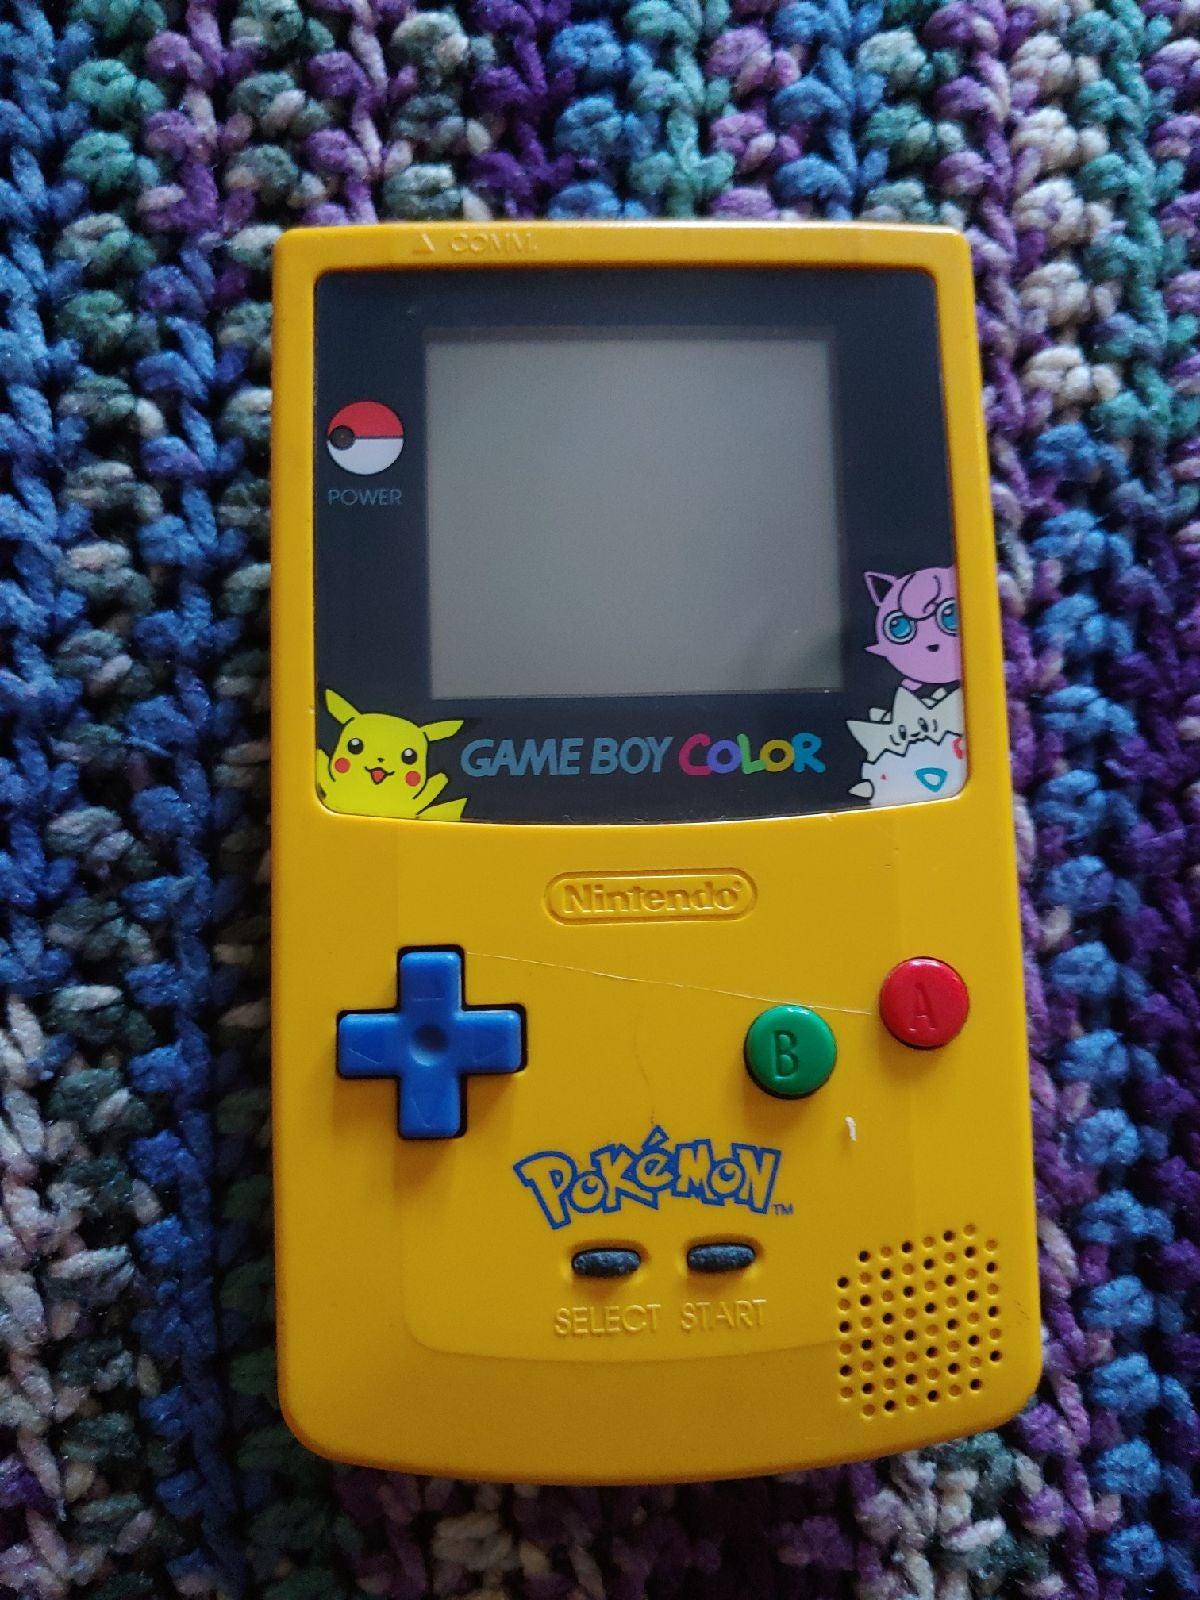 (No power) Game boy Color pokemon